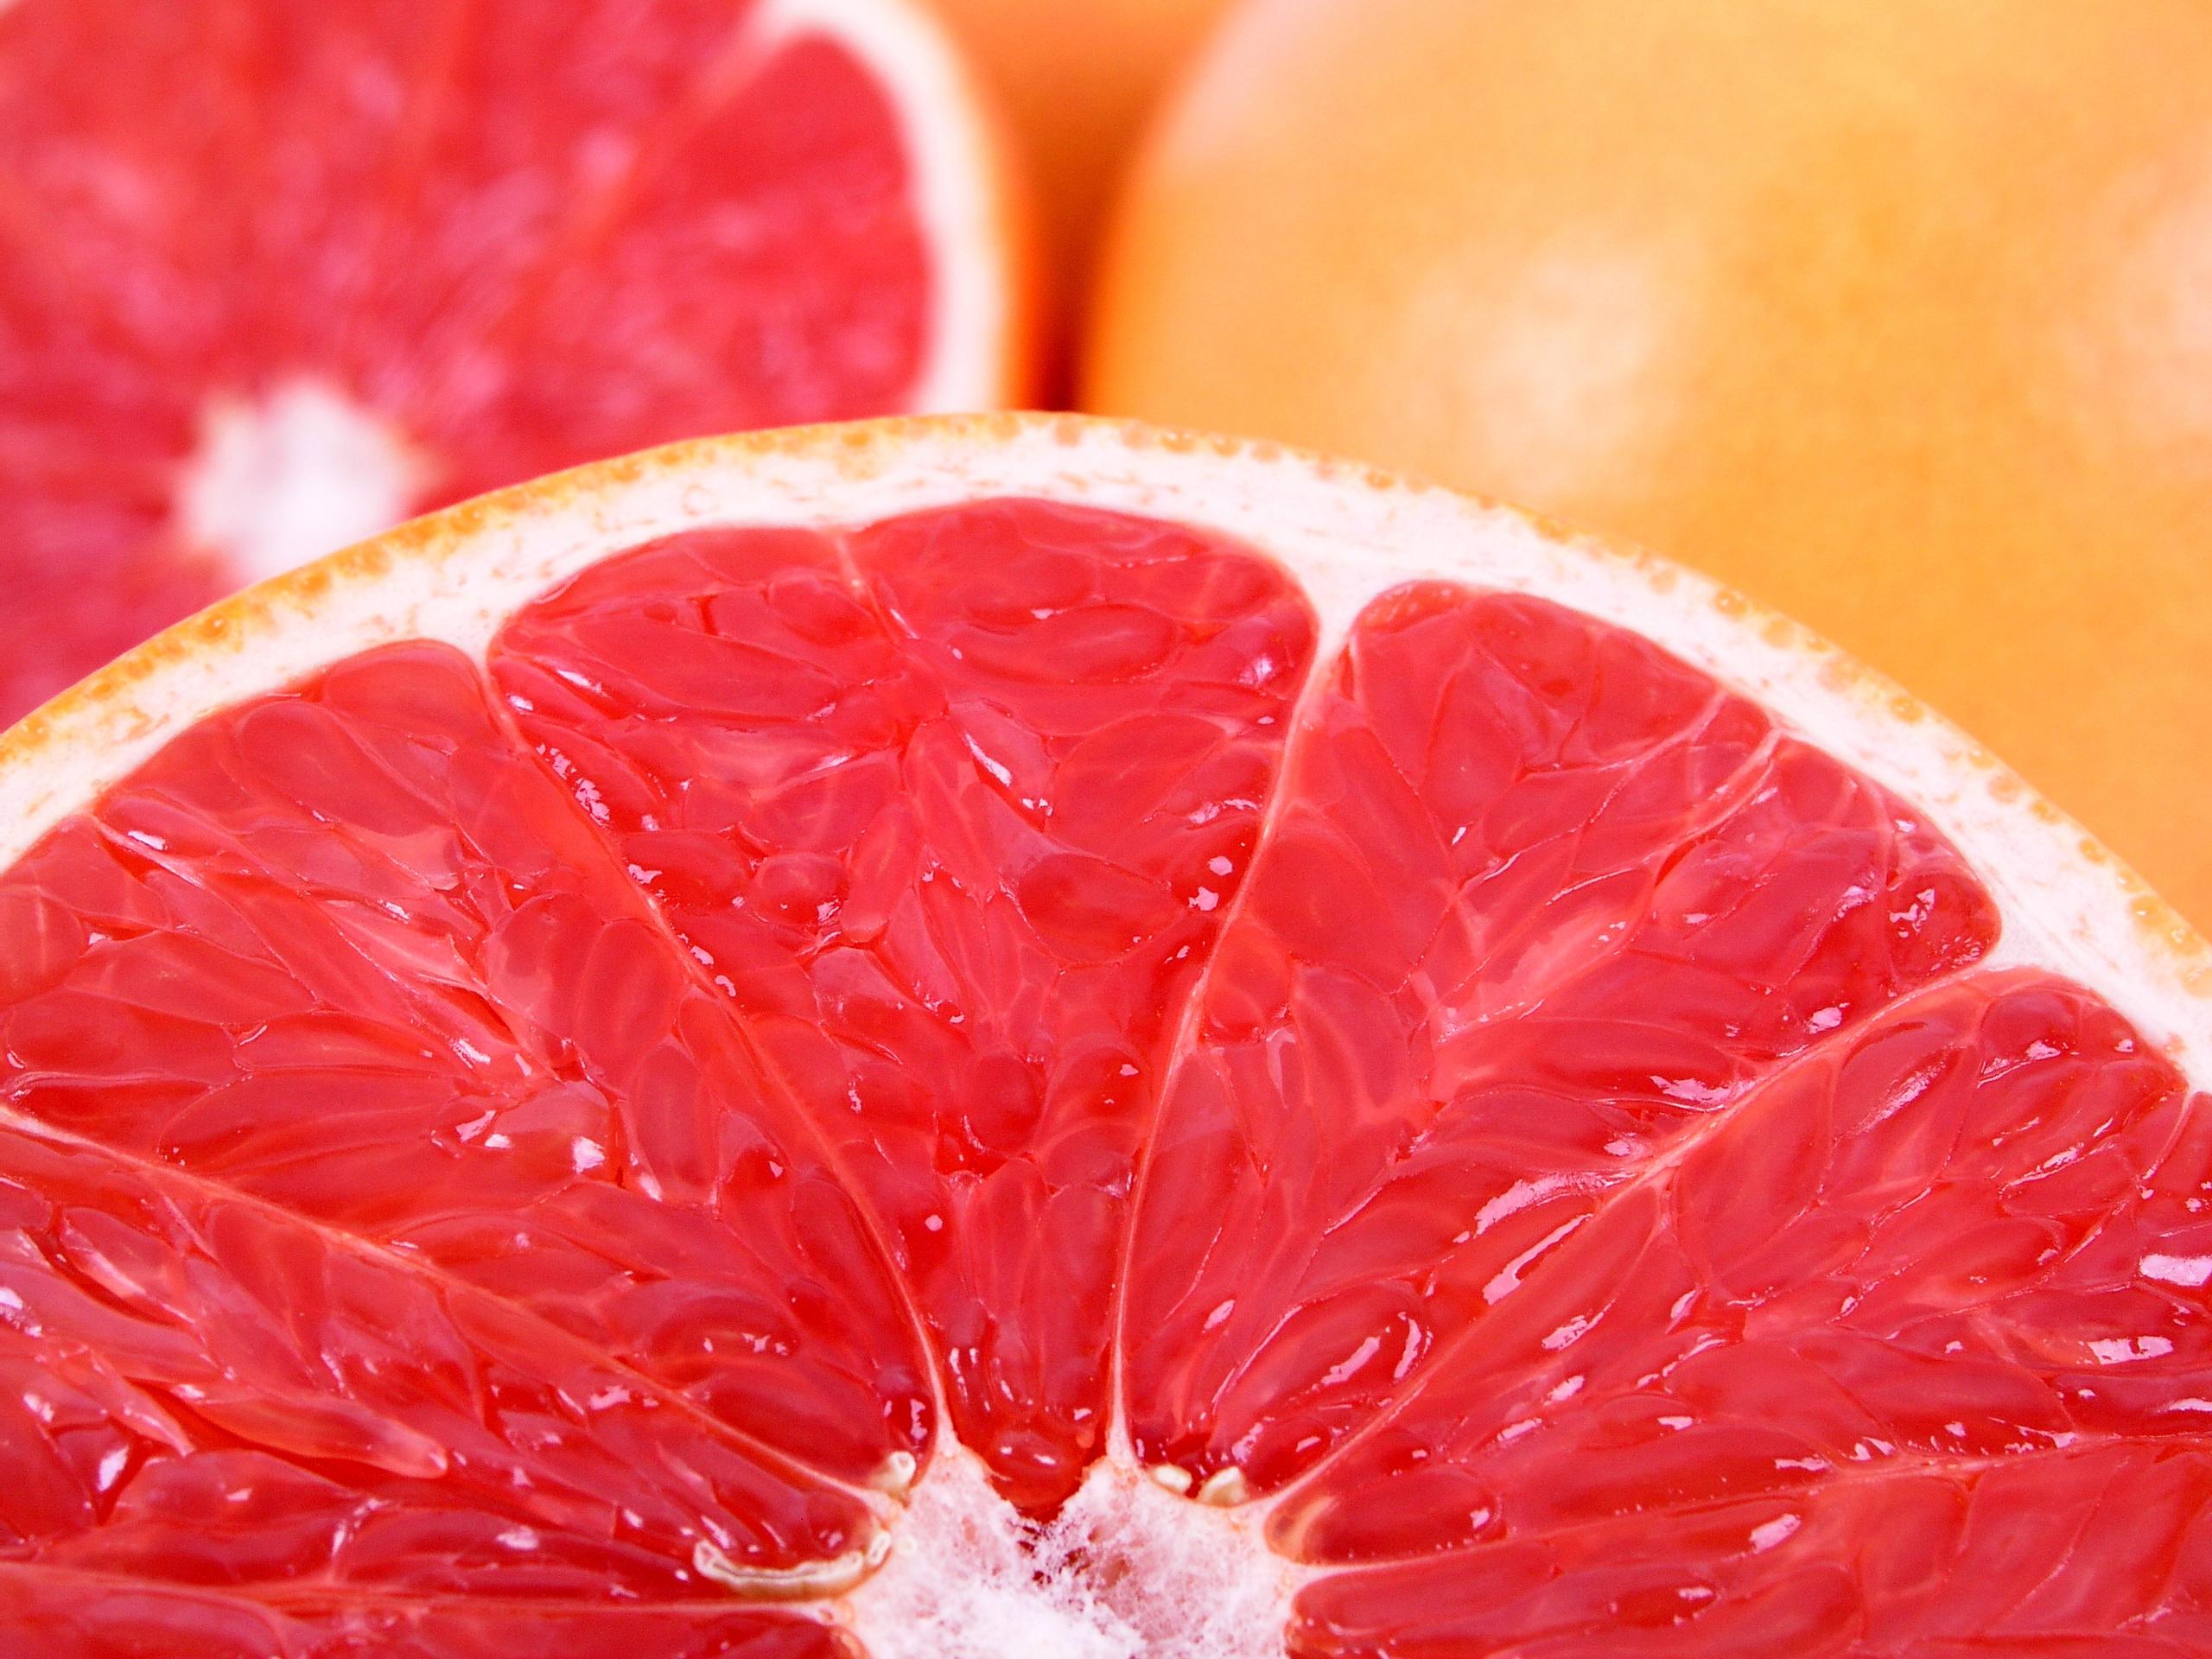 Amazing Grapefruit Wallpaper